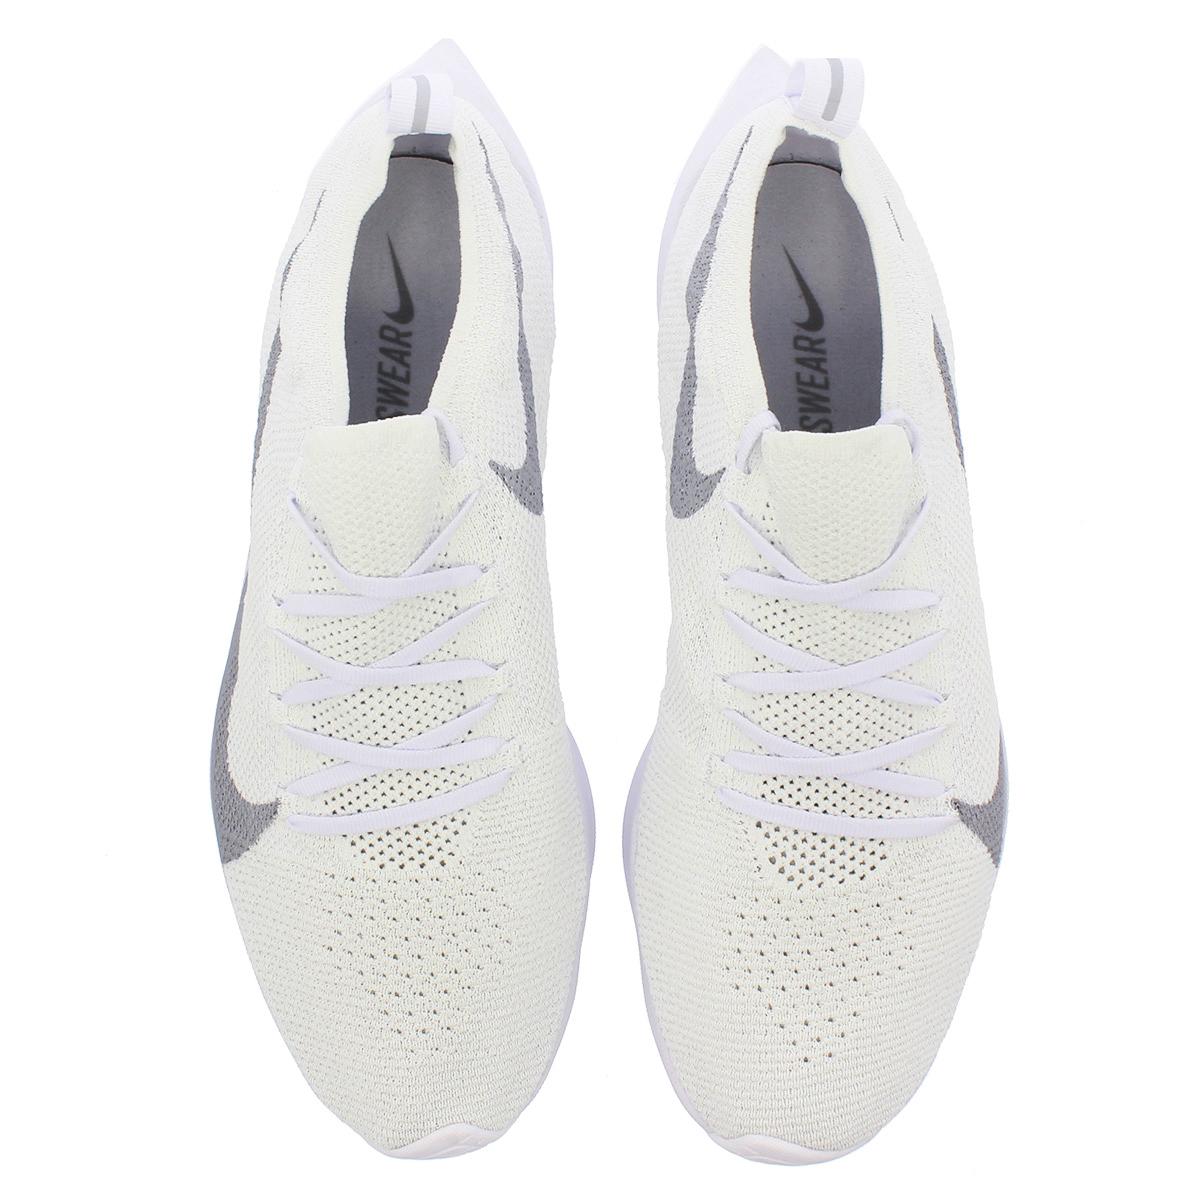 31912f8fdd60d NIKE VAPOR STREET FLYKNIT Nike vapor street fried food knit WHITE WOLF GREY VIETNAM  aq1763-100